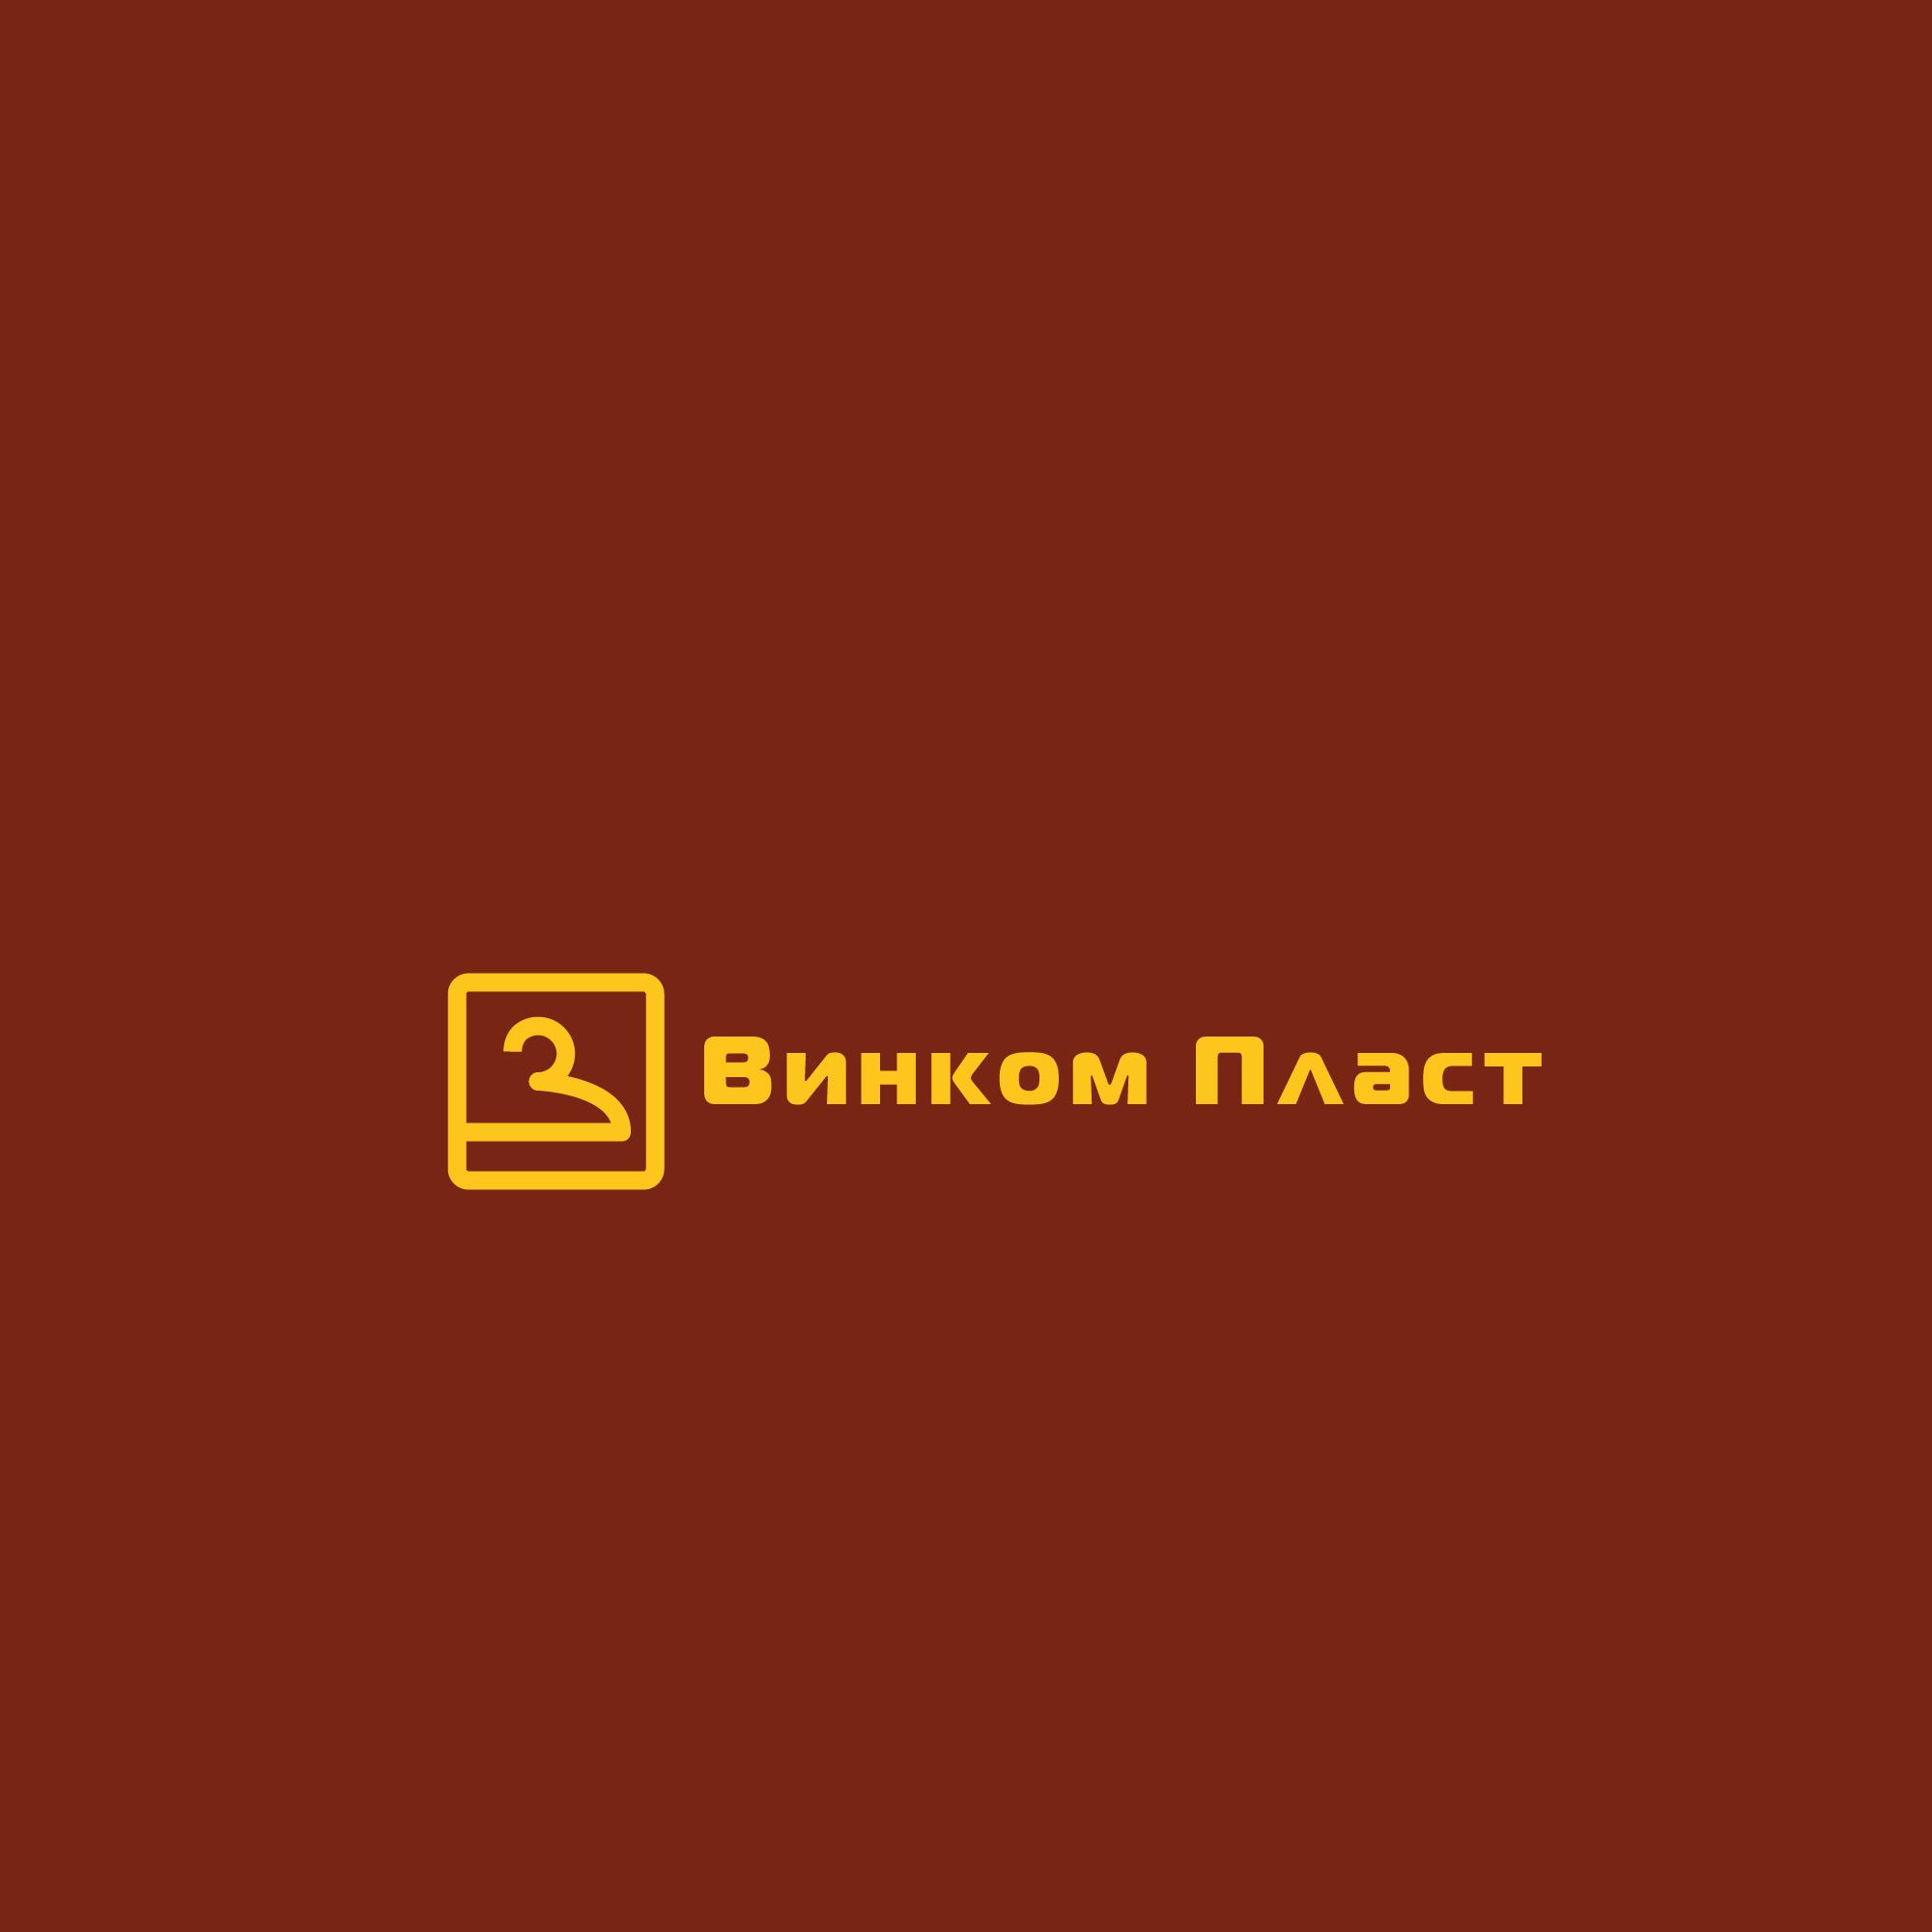 Логотип, фавикон и визитка для компании Винком Пласт  фото f_4205c3d78573b6a4.jpg